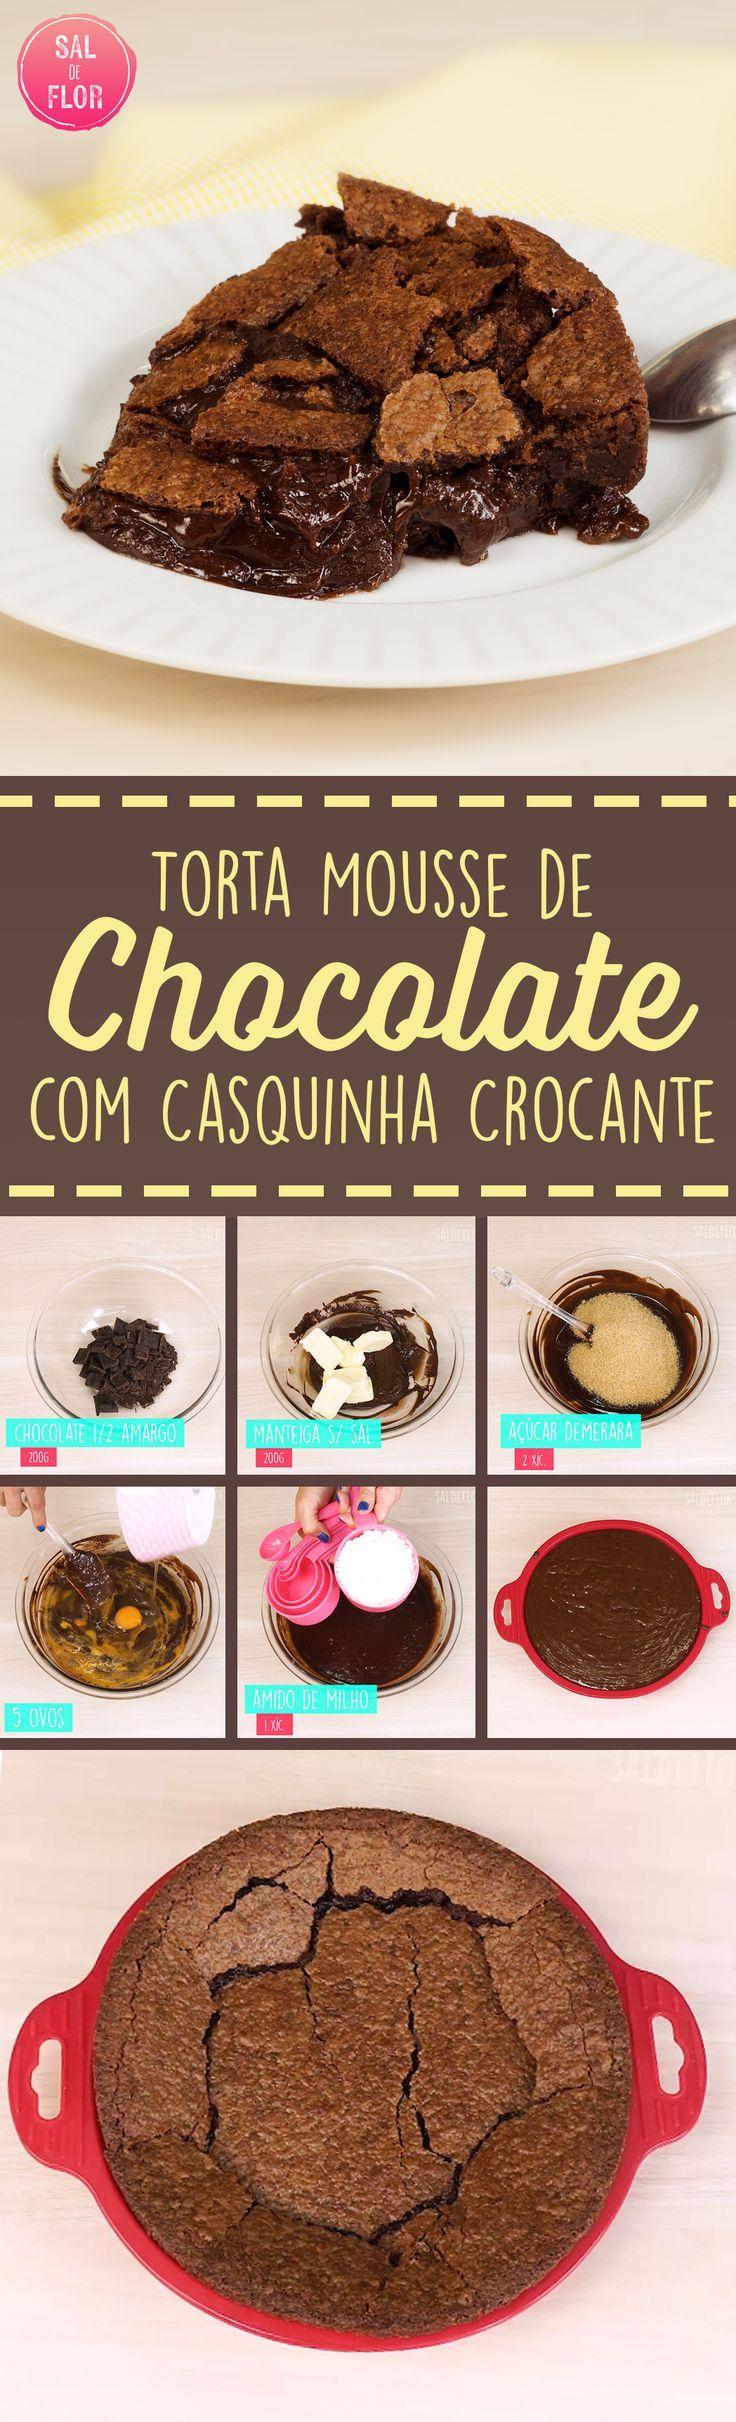 Torta mousse de chocolate crocante #opaDhay